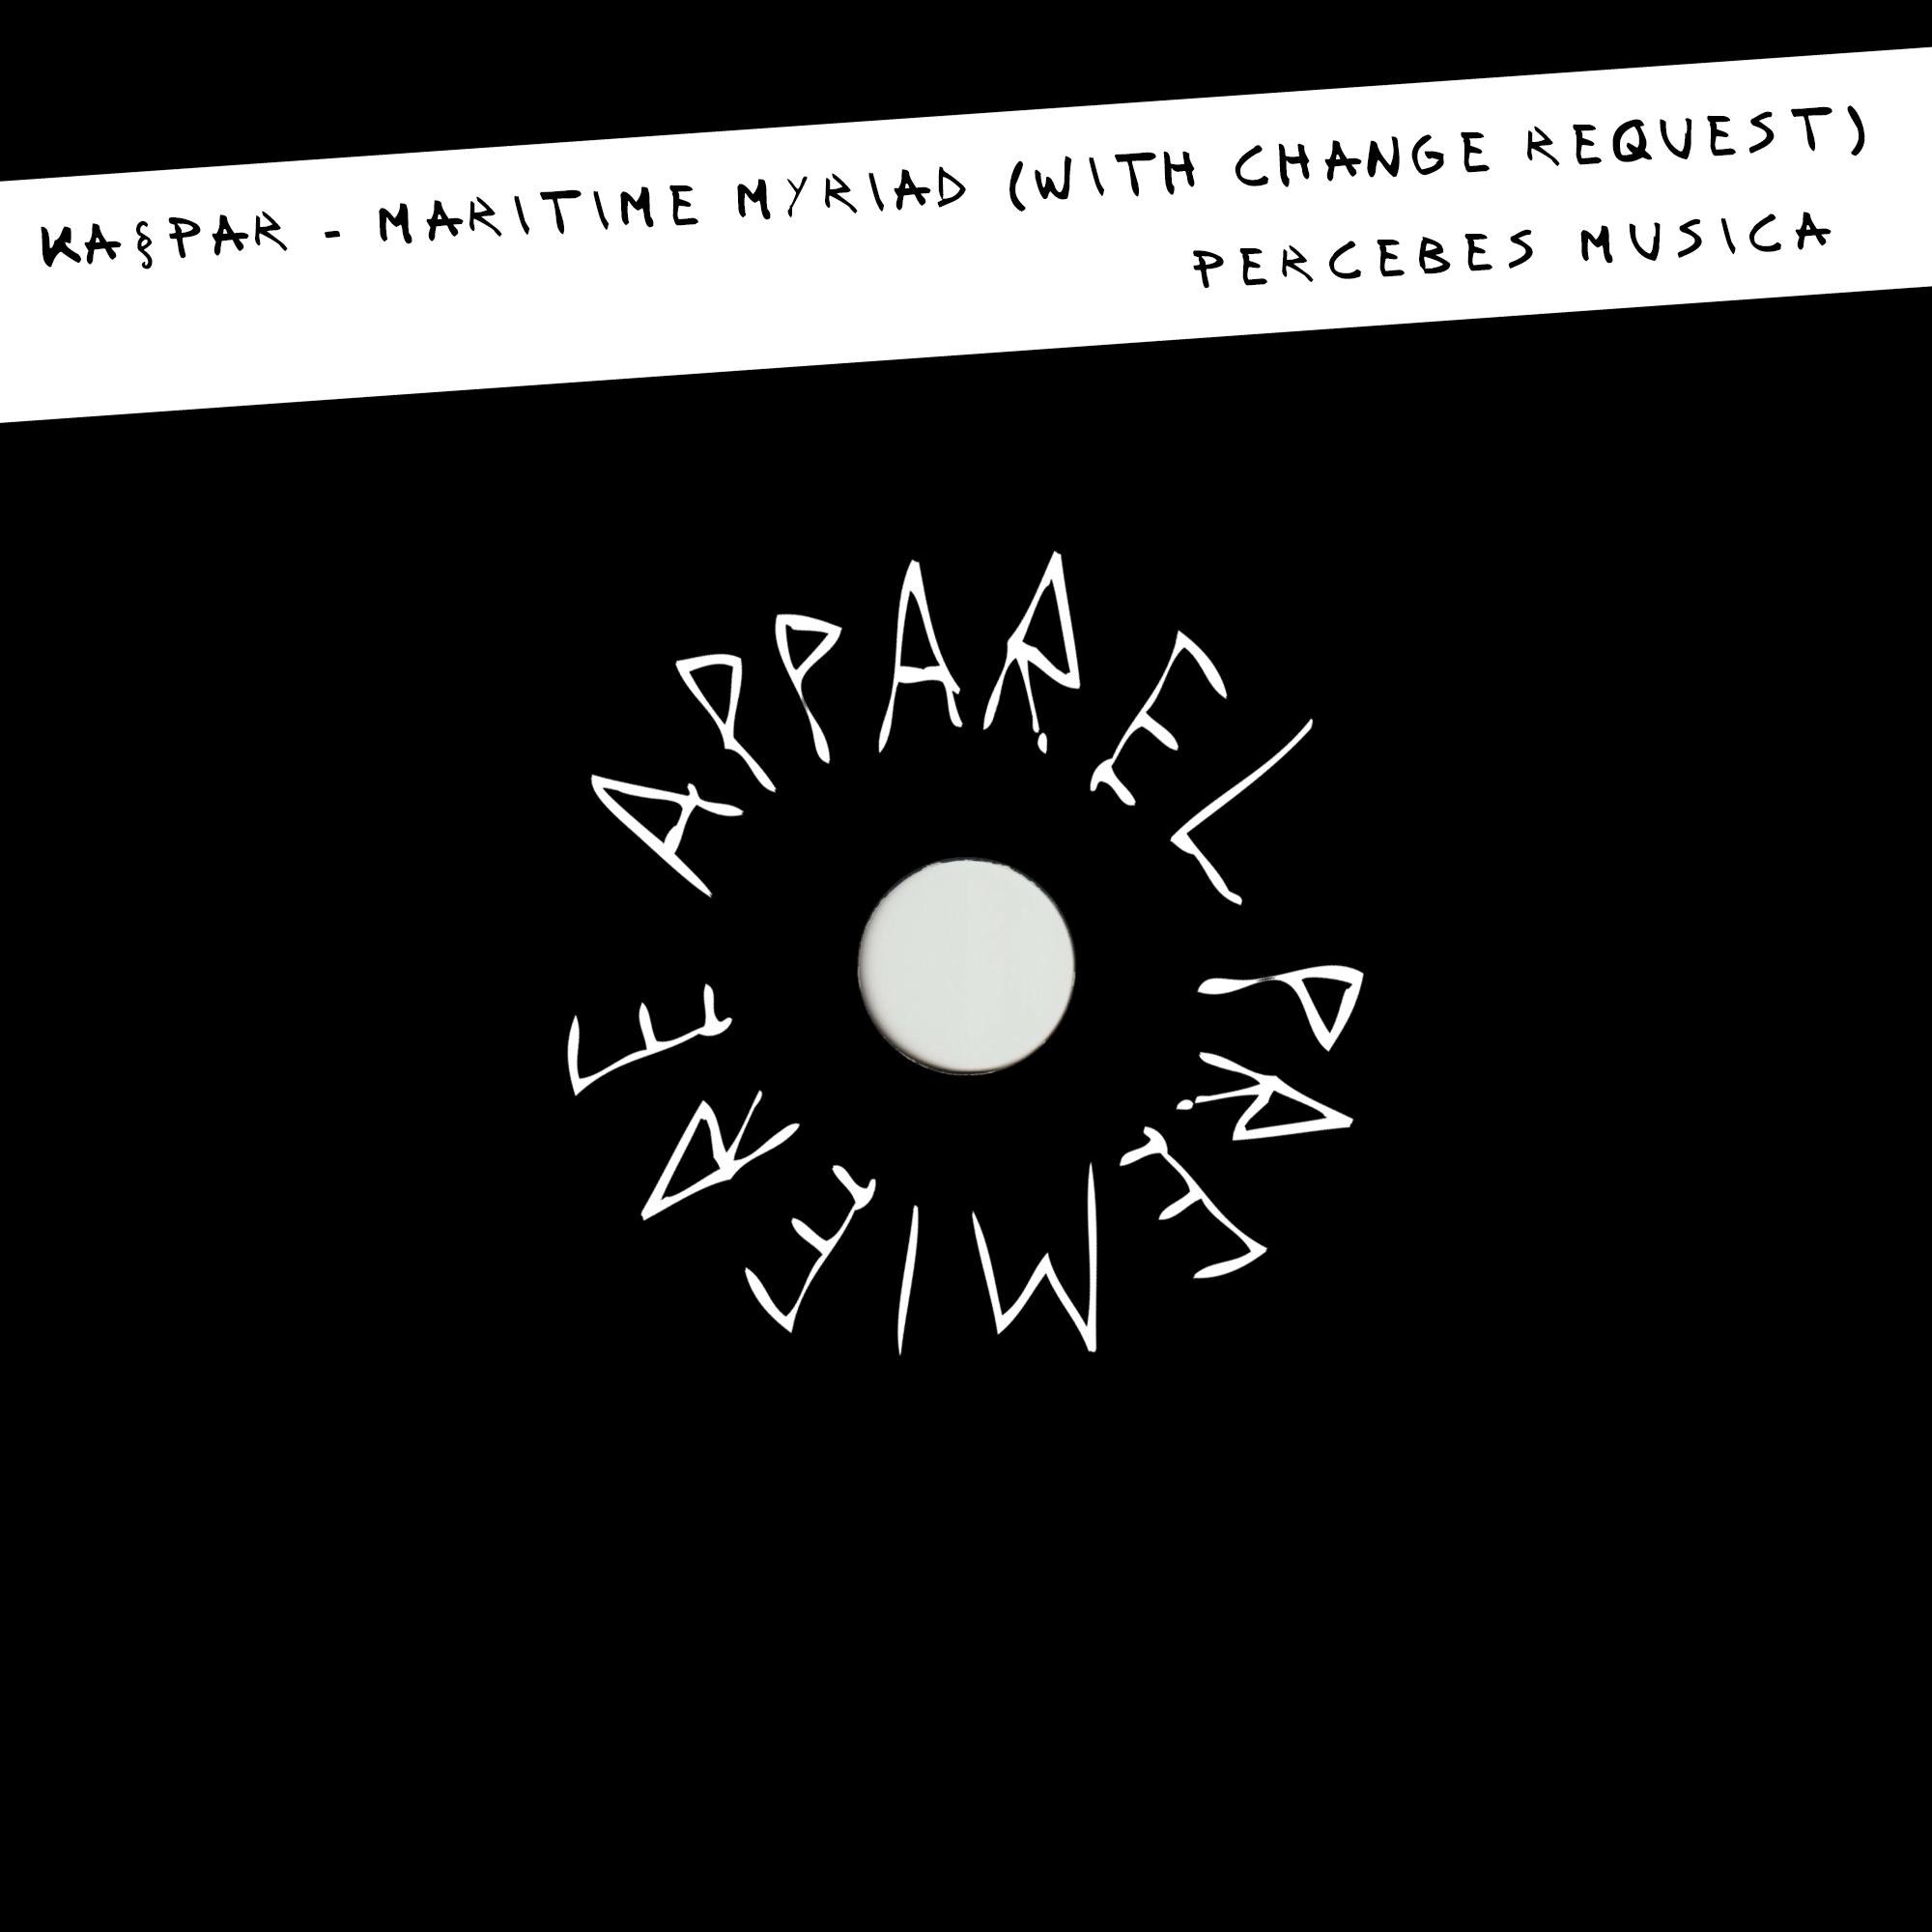 APPAREL PREMIERE: Ka§par – Maritime Myriad (with Change Request) [Percebes Musica]